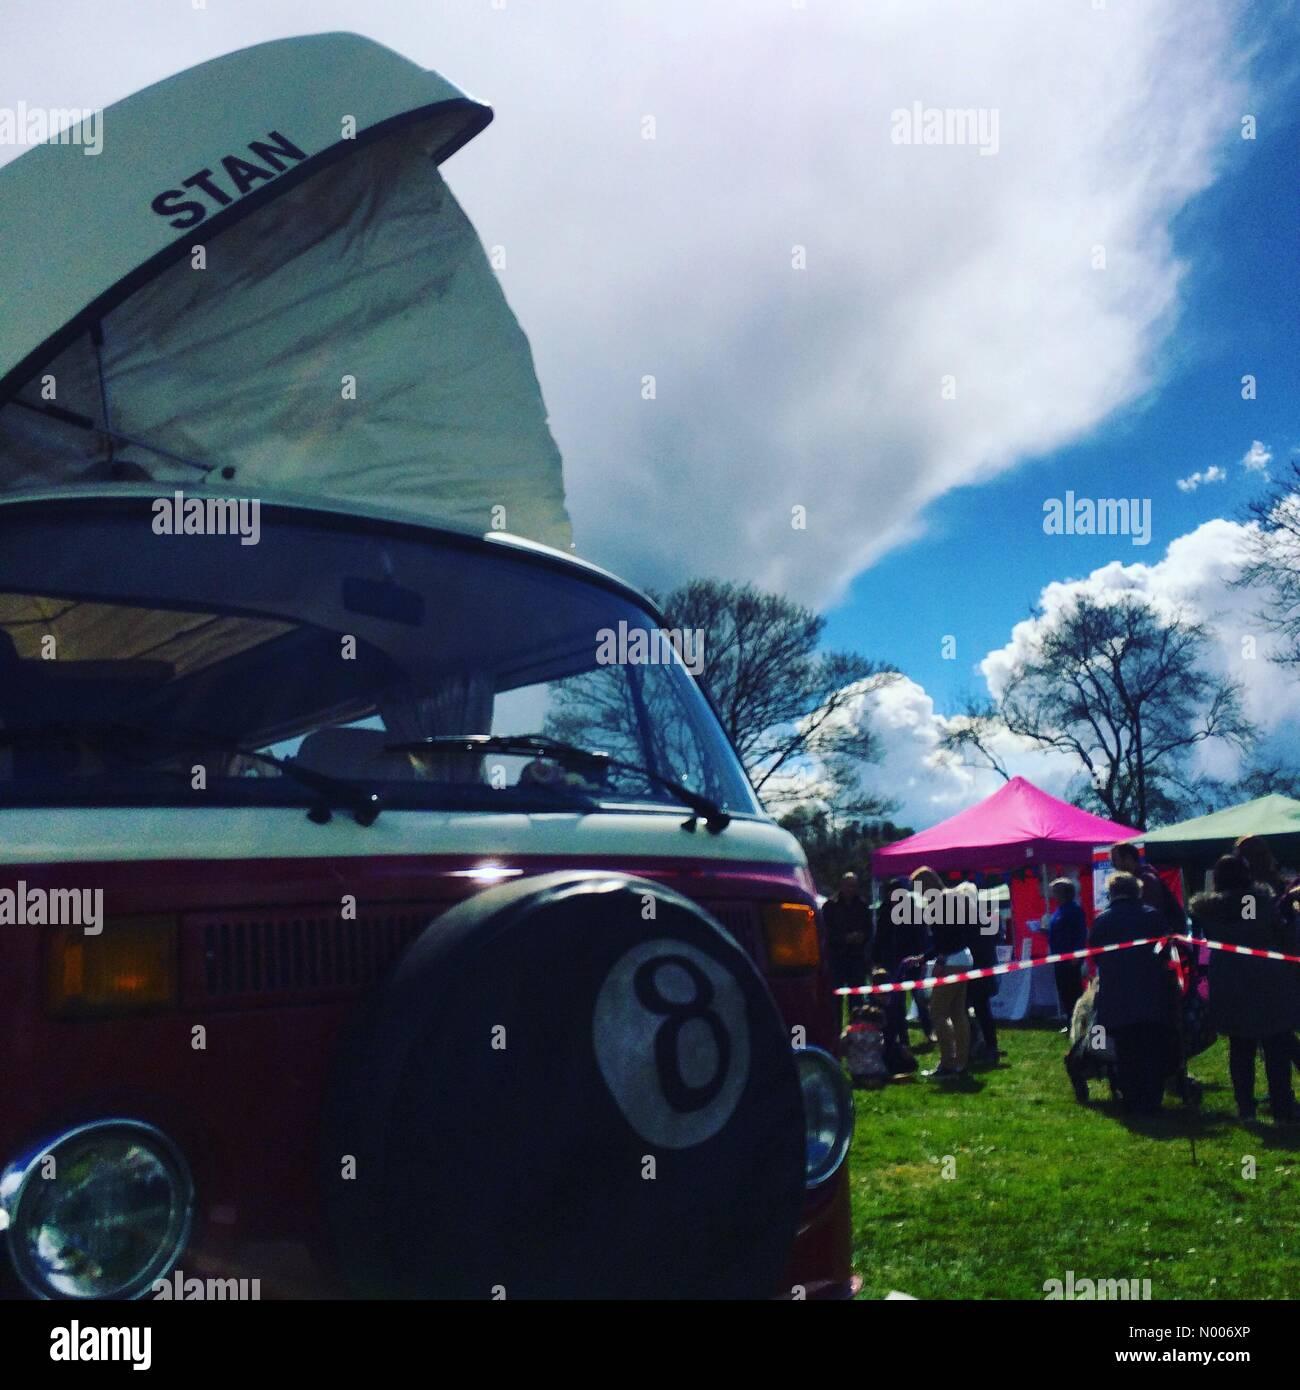 Godalming, Surrey, UK. 30th Apr, 2016. UK Weather 30th April 2016: A cumulonimbus cloud looming over the town fete - Stock Image